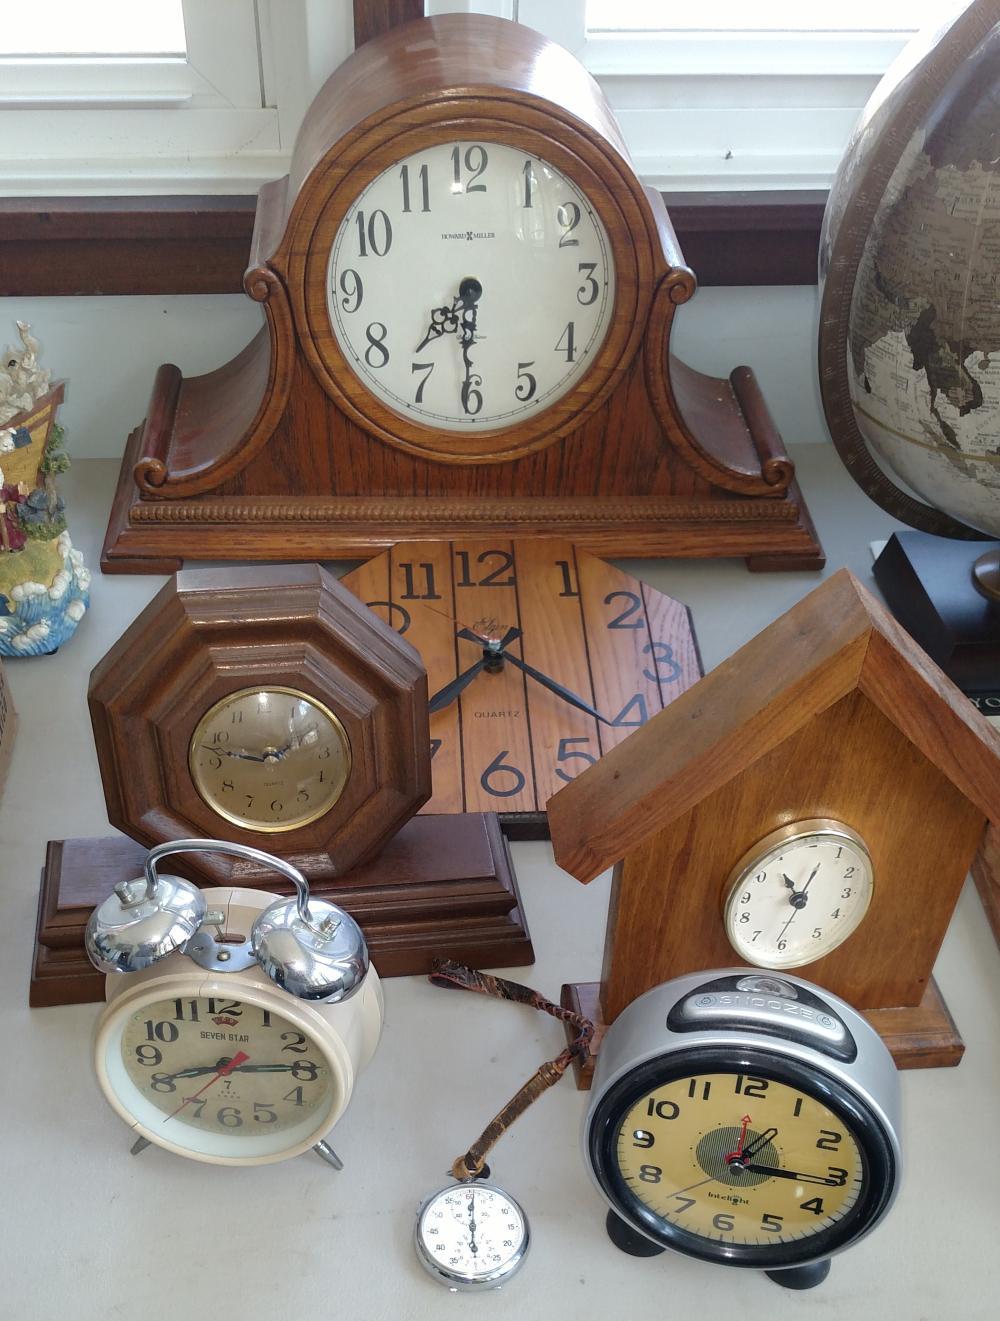 howard miller mantle clock, other clocks, alarm clocks, stop watch